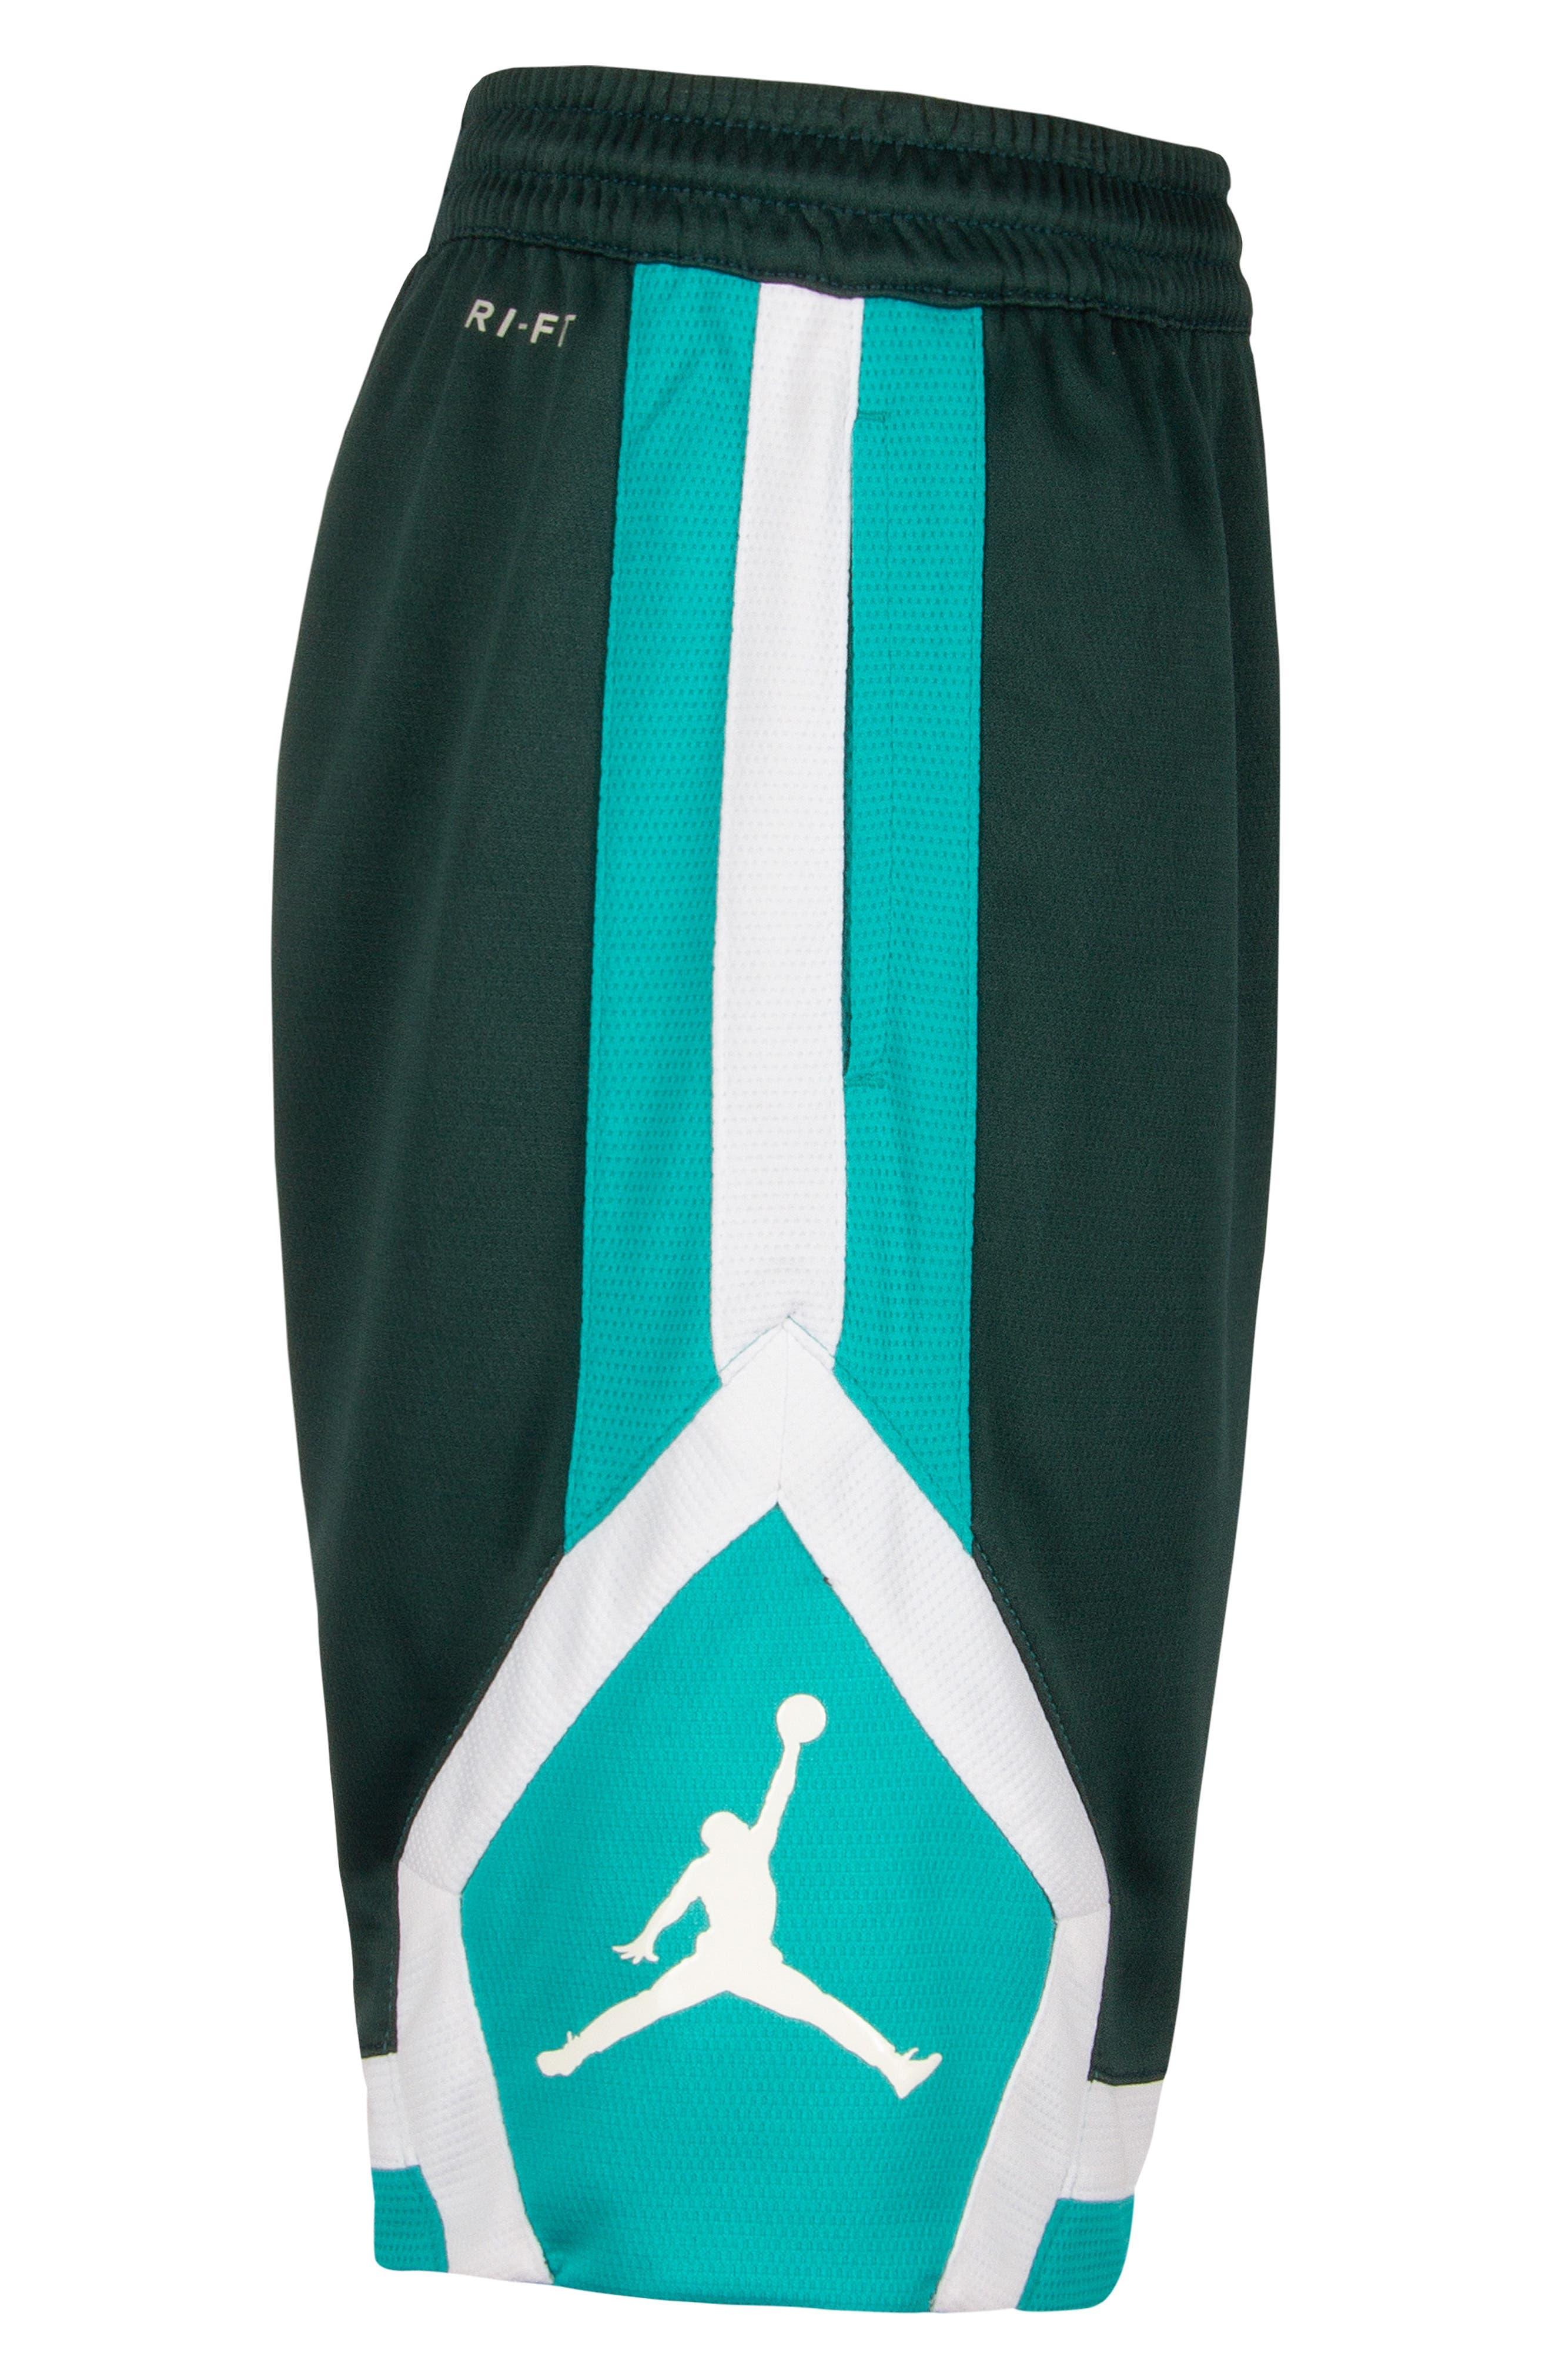 Jordan Rise Athletic Shorts,                             Alternate thumbnail 4, color,                             MIDNIGHT SPRUCE